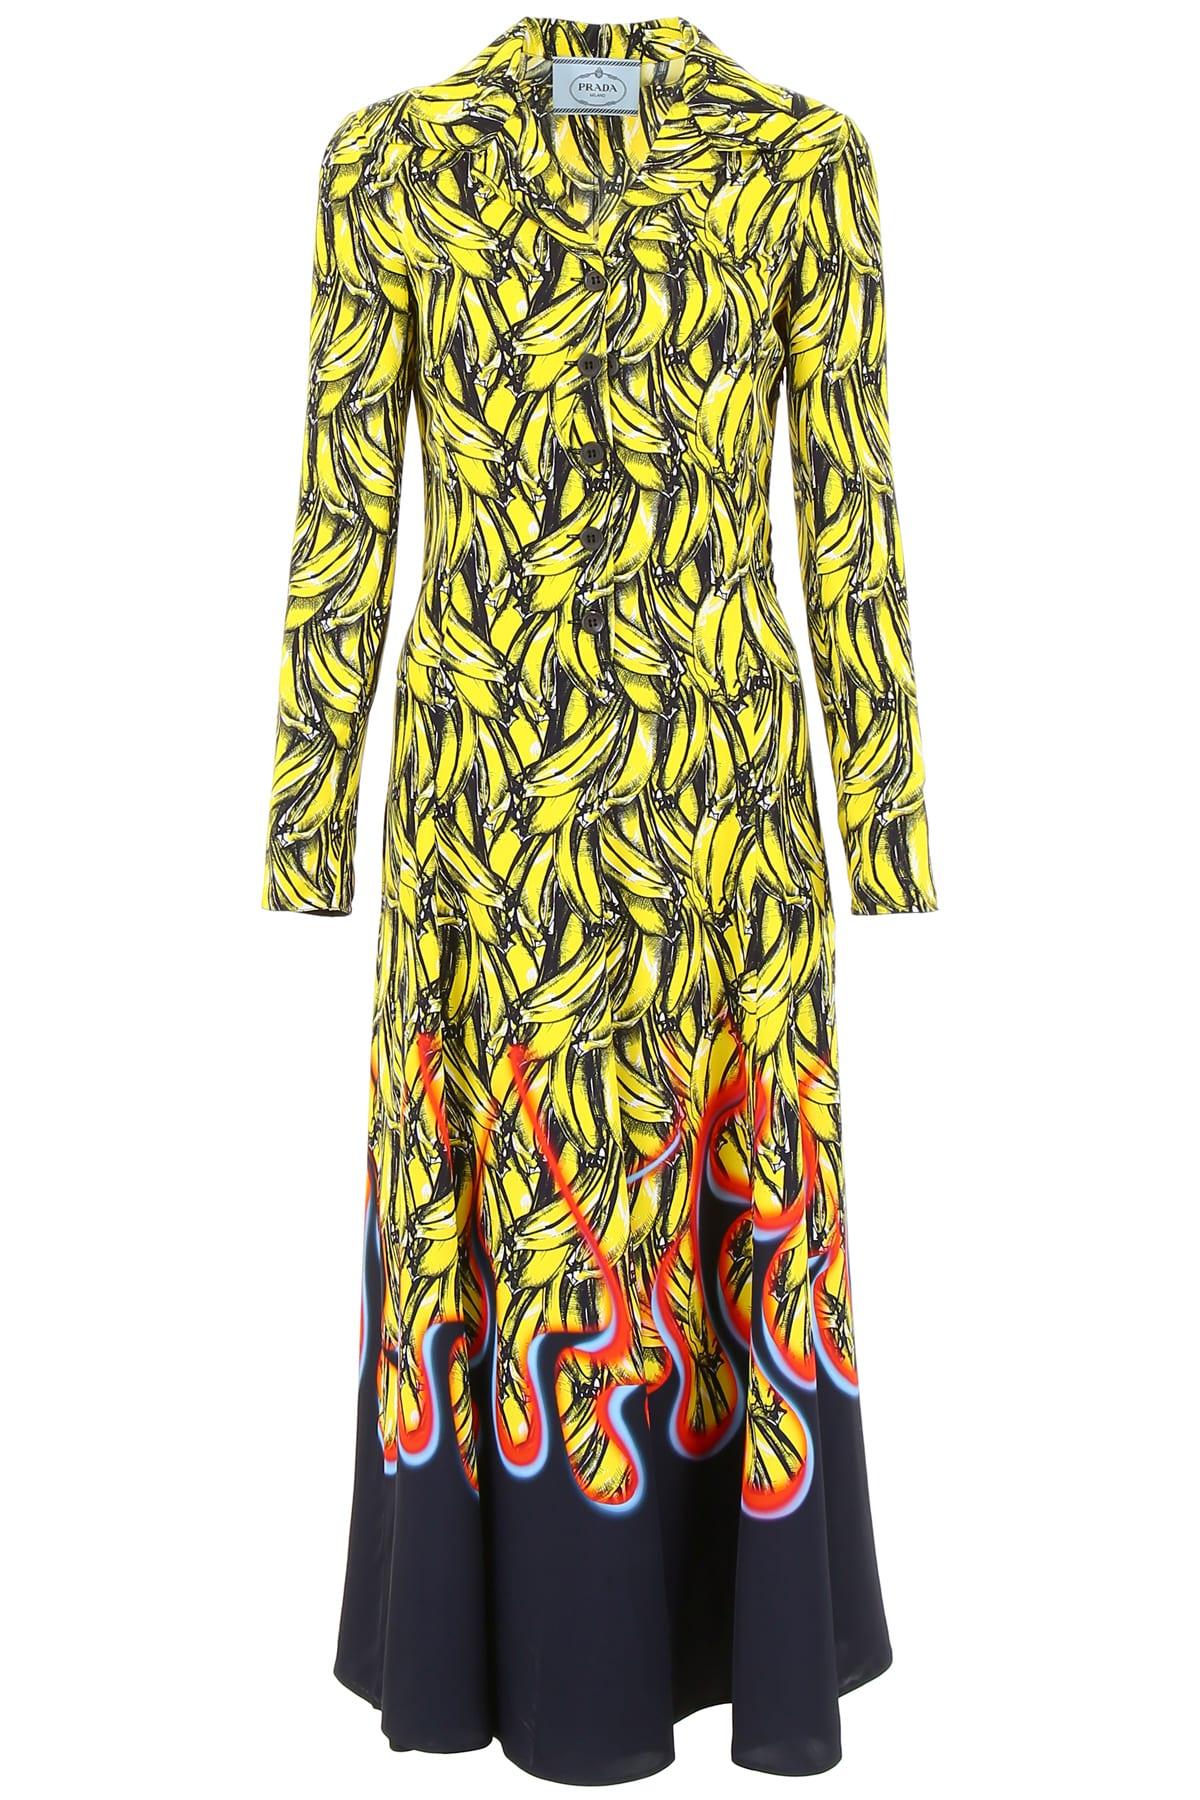 Prada Bananas And Flames Dress